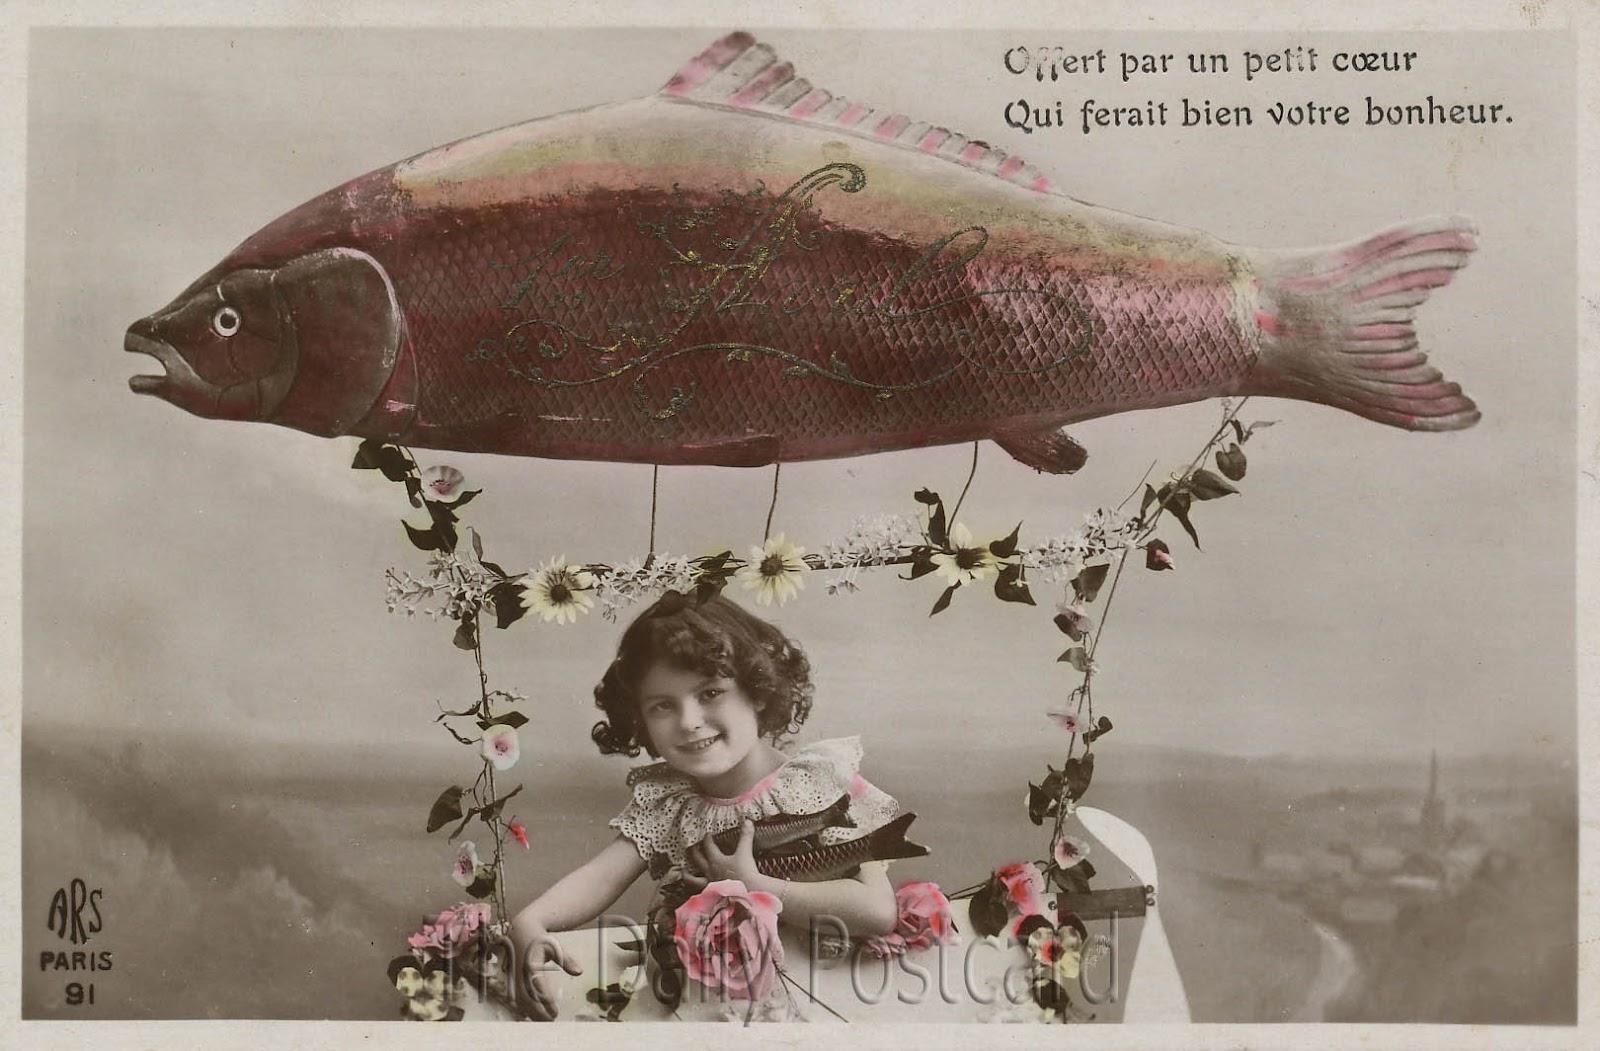 poisson d' avril post cards 8